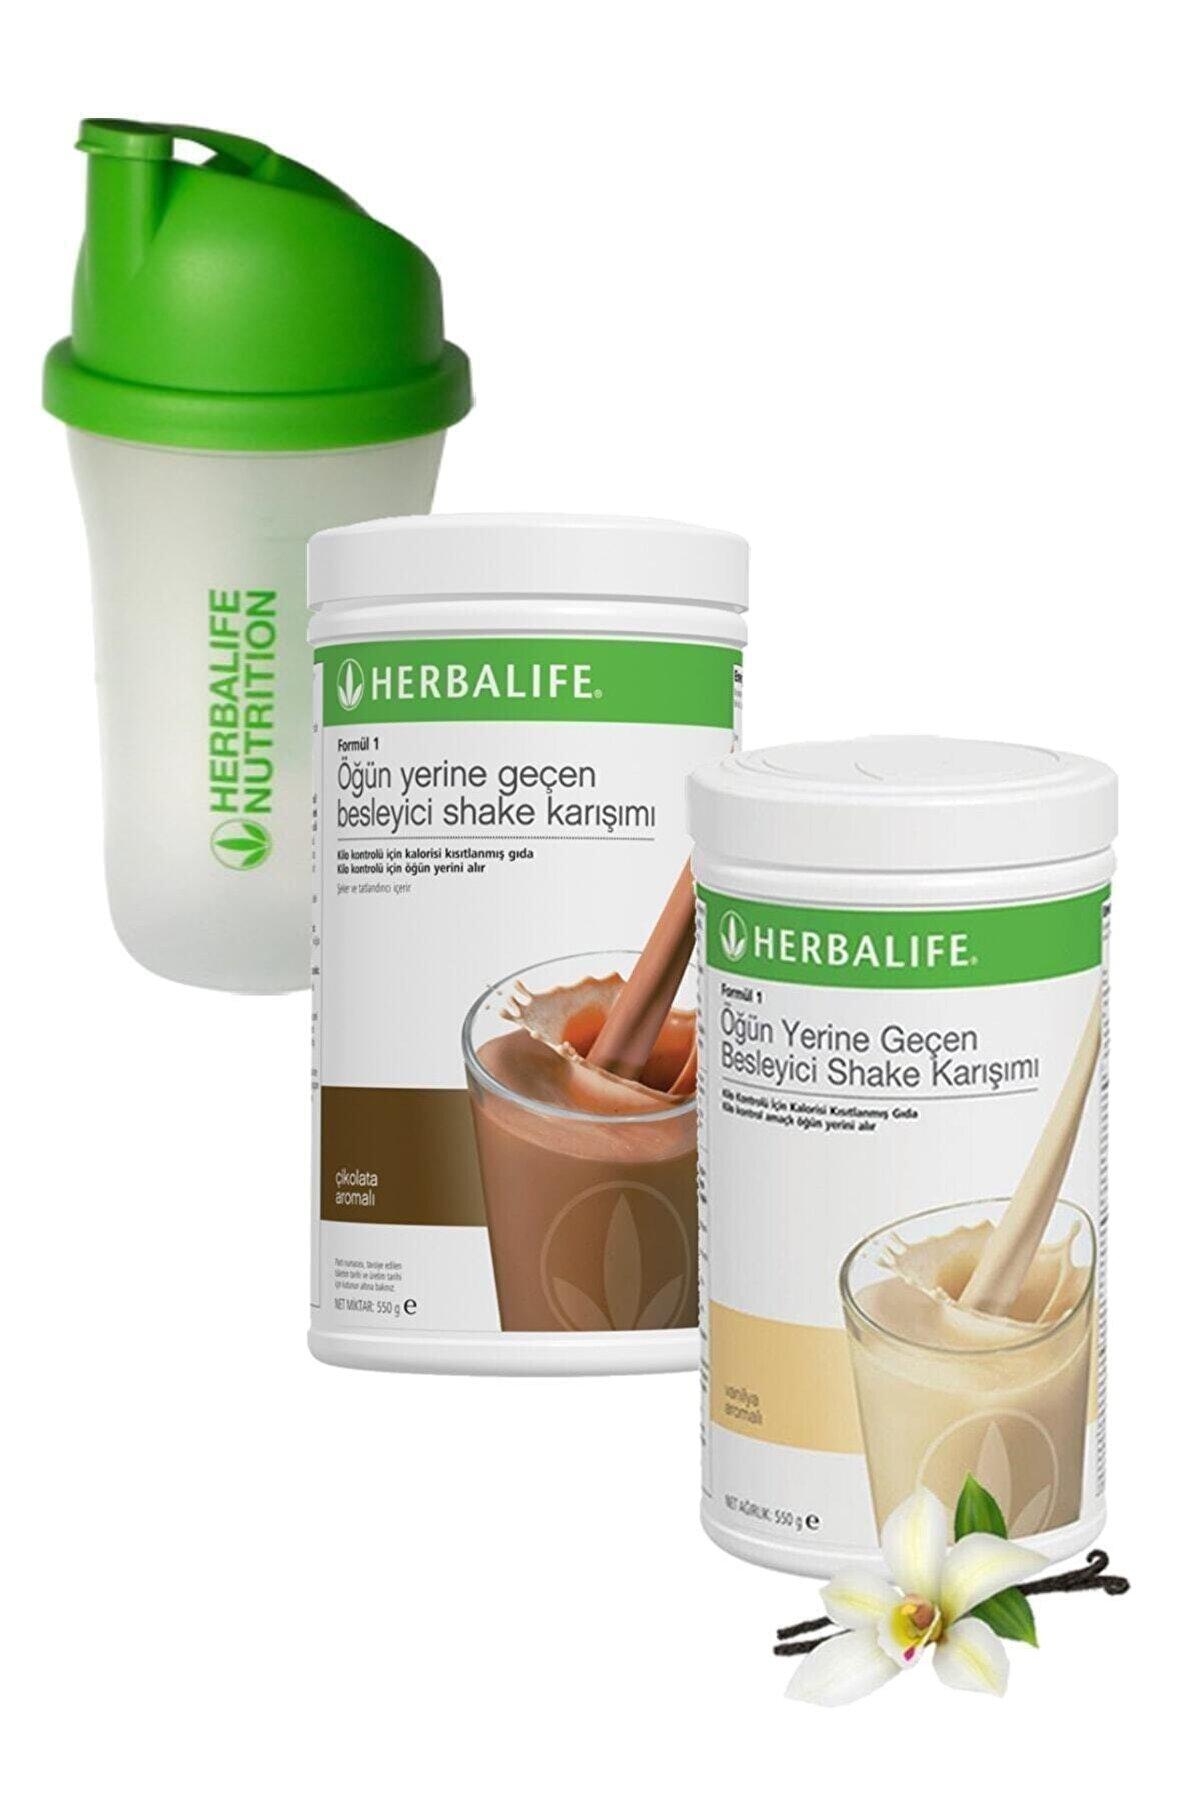 Herbalife Formül 1 Shake Karışım Seti Çikolata + Vanilya 550 gr + Shaker